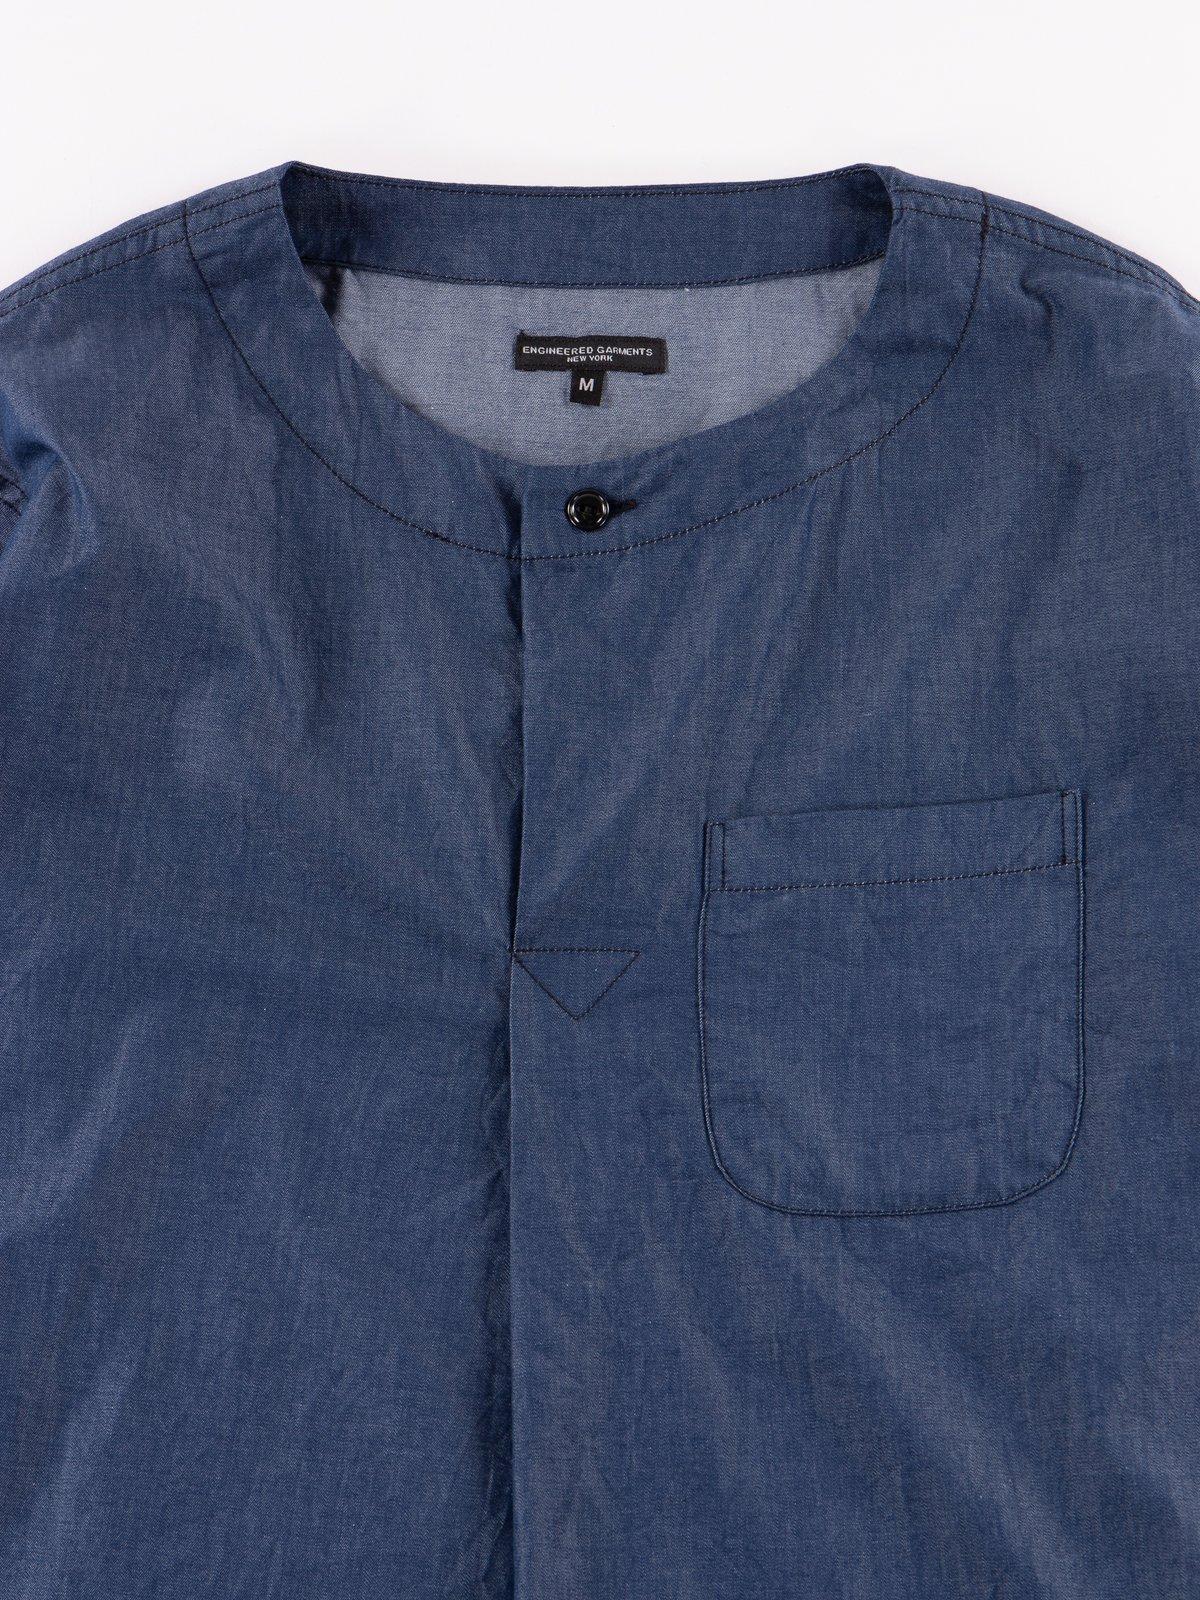 Navy Light Weight Denim MED Shirt - Image 3